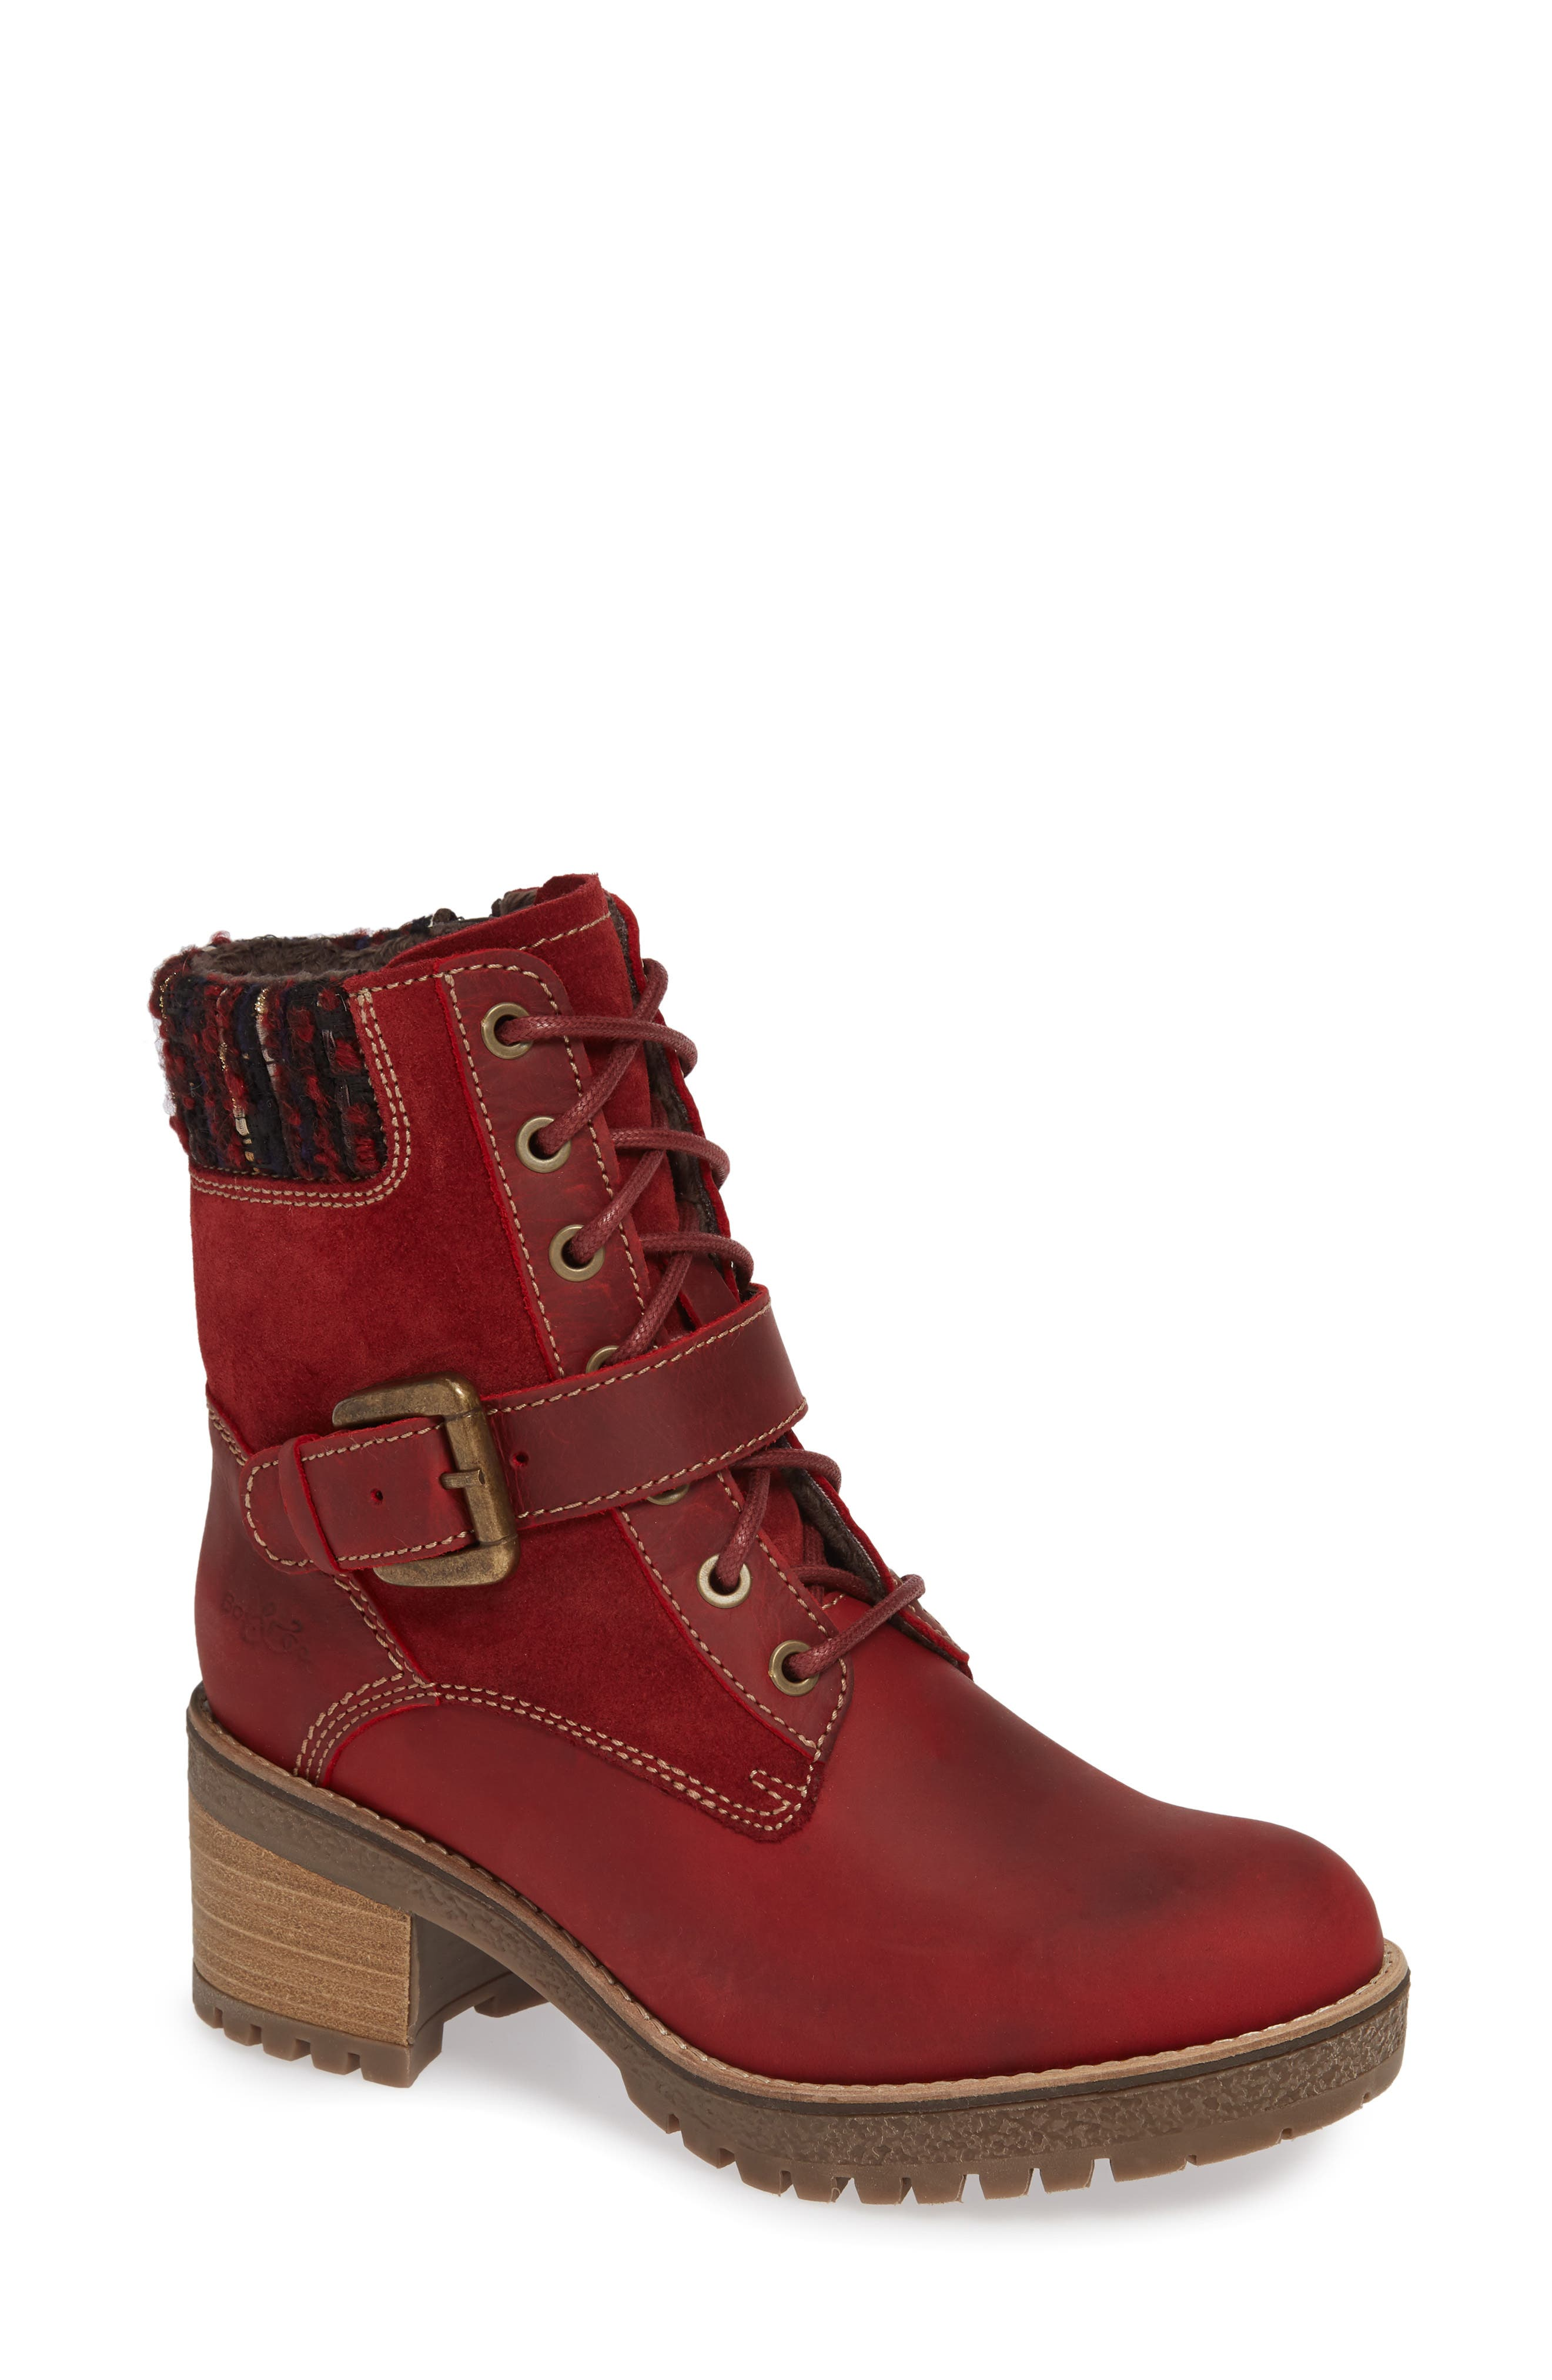 Bos. & Co. Marvel Waterproof Moto Boot, Red